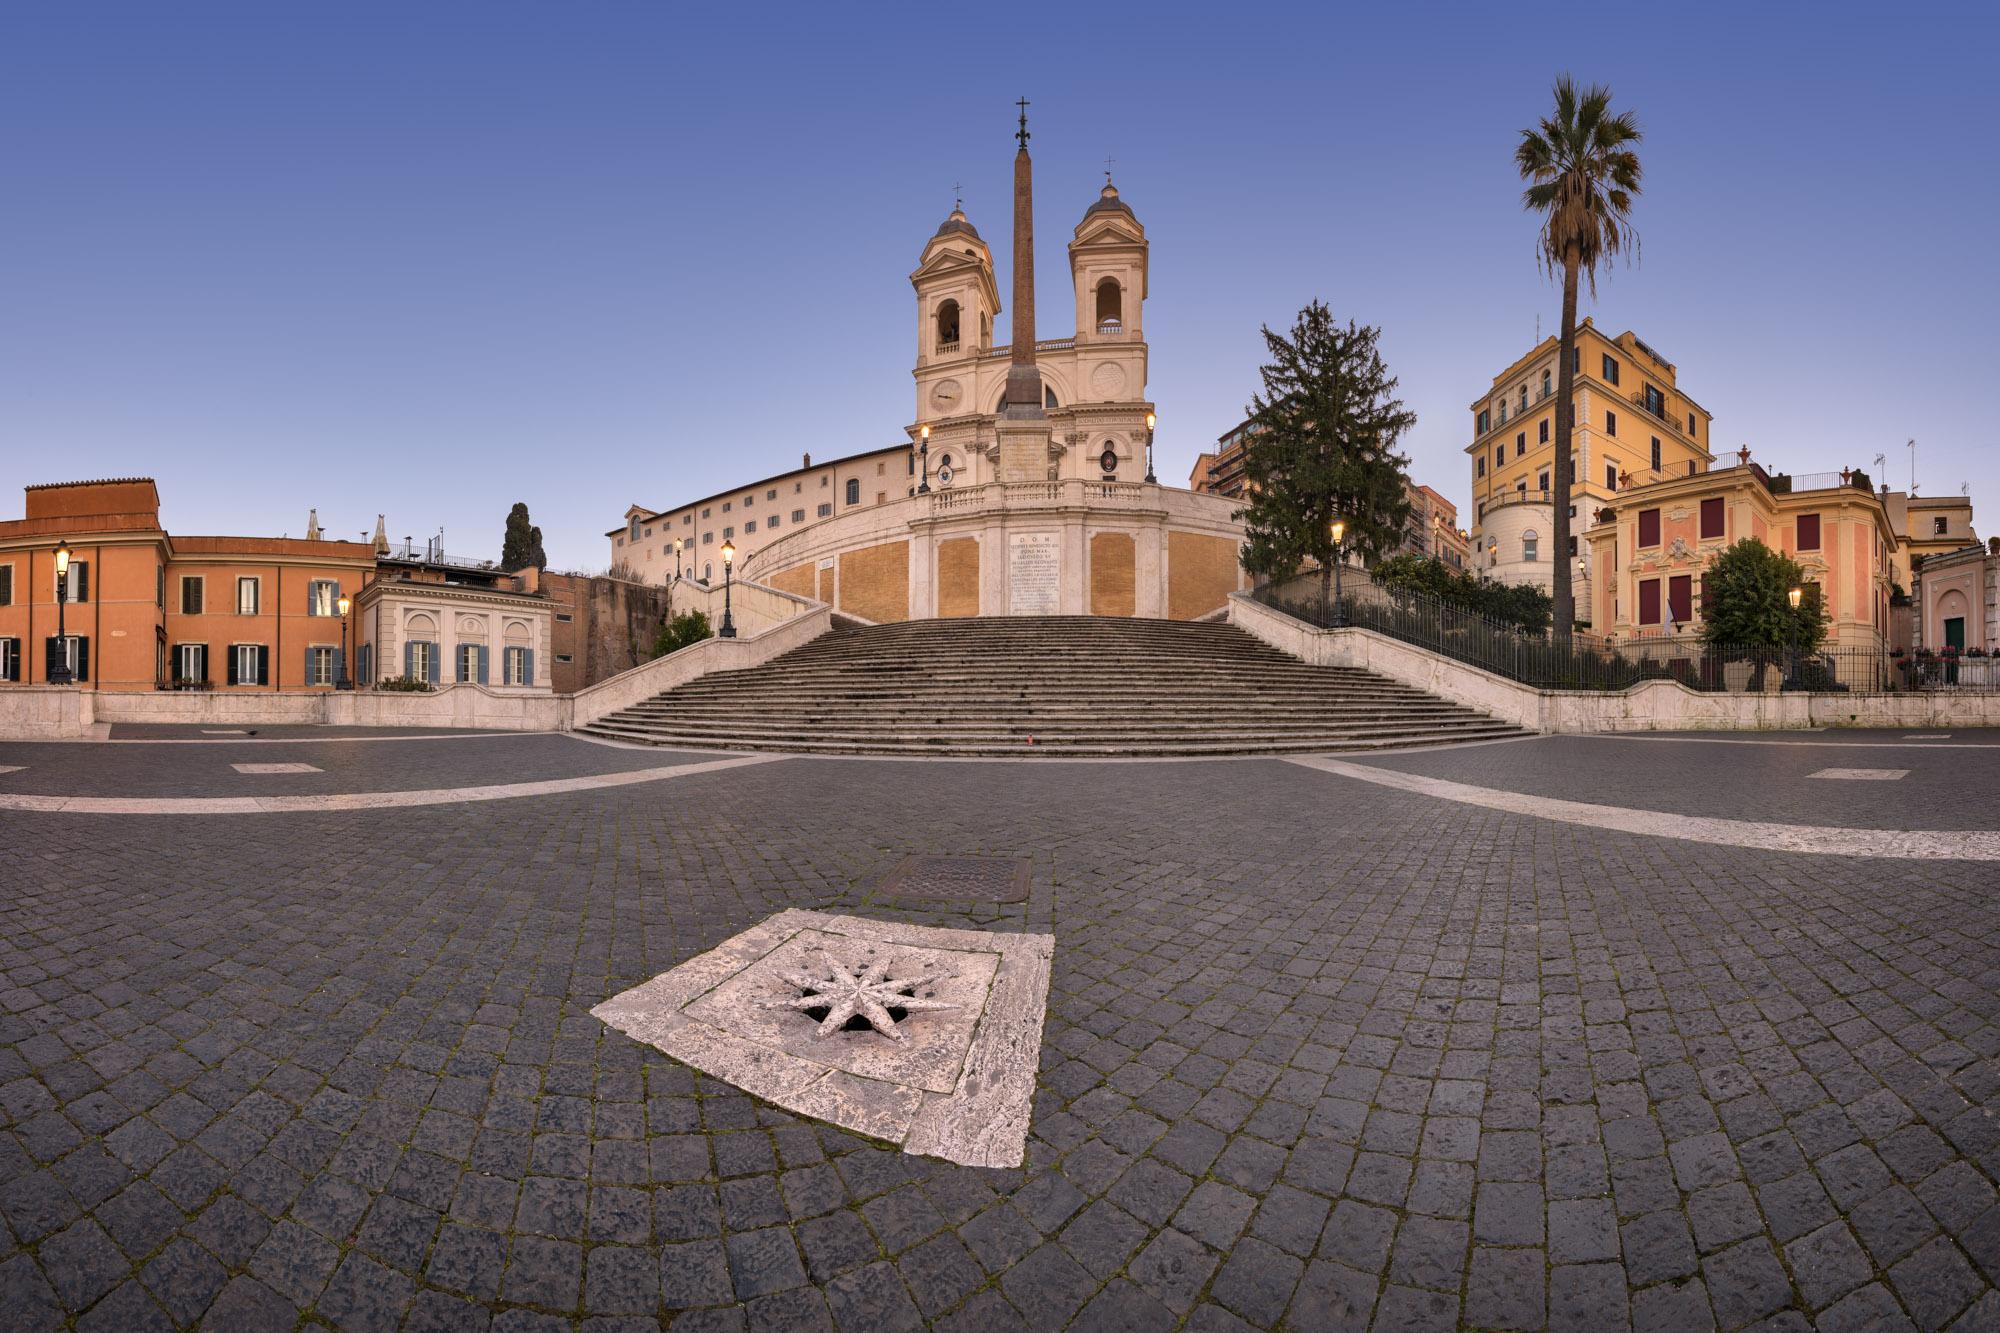 Spanish Steps and Trinita dei Monti Church, Rome, Italy